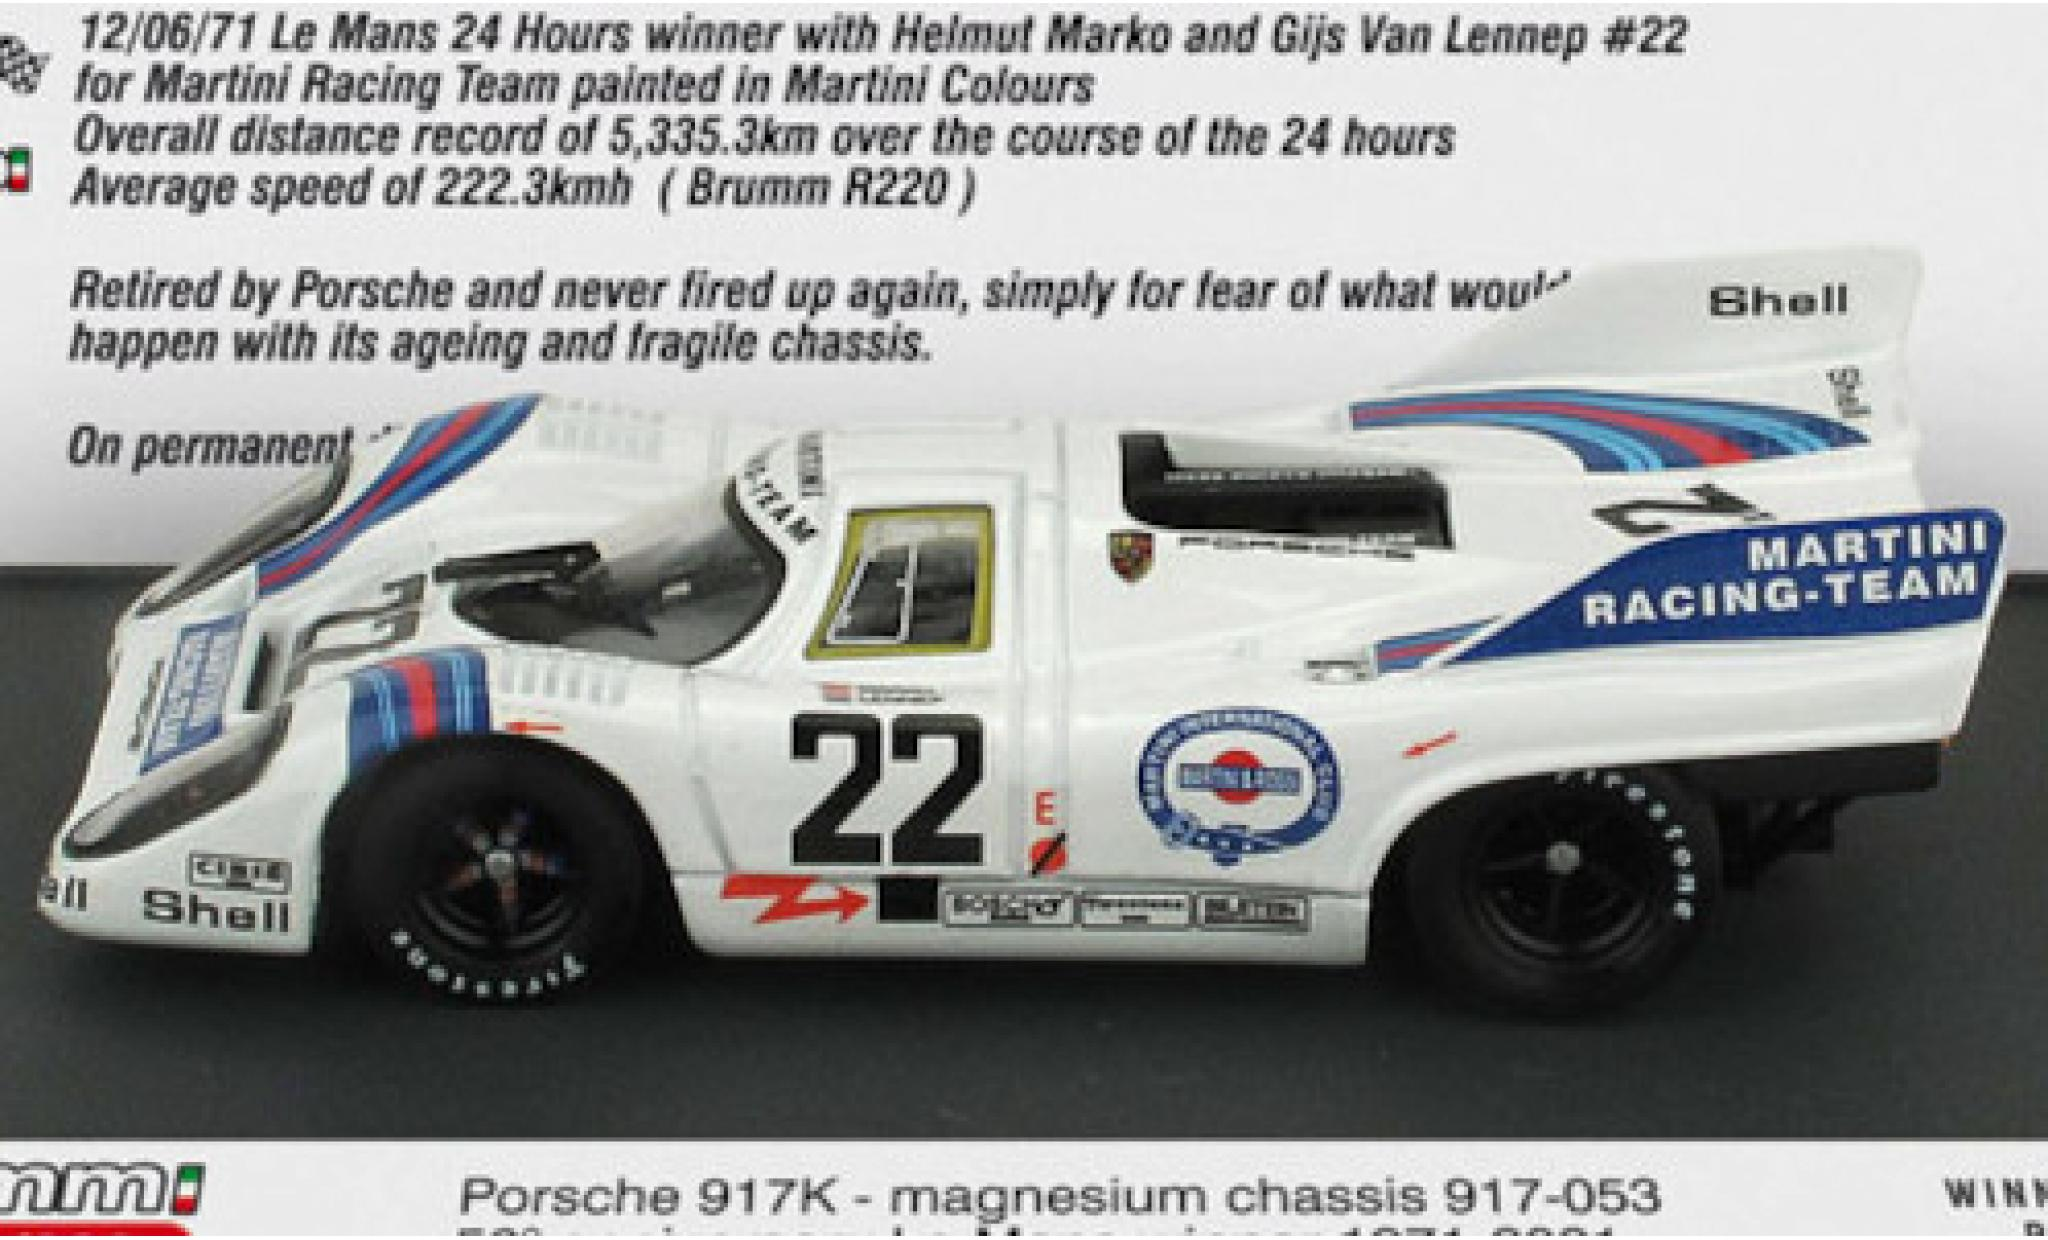 Porsche 917 1971 1/43 Brumm K RHD No.22 Martini Racing Team Martini 24h Le Mans in Sonderverpackung H.Marko/G.van Lennep